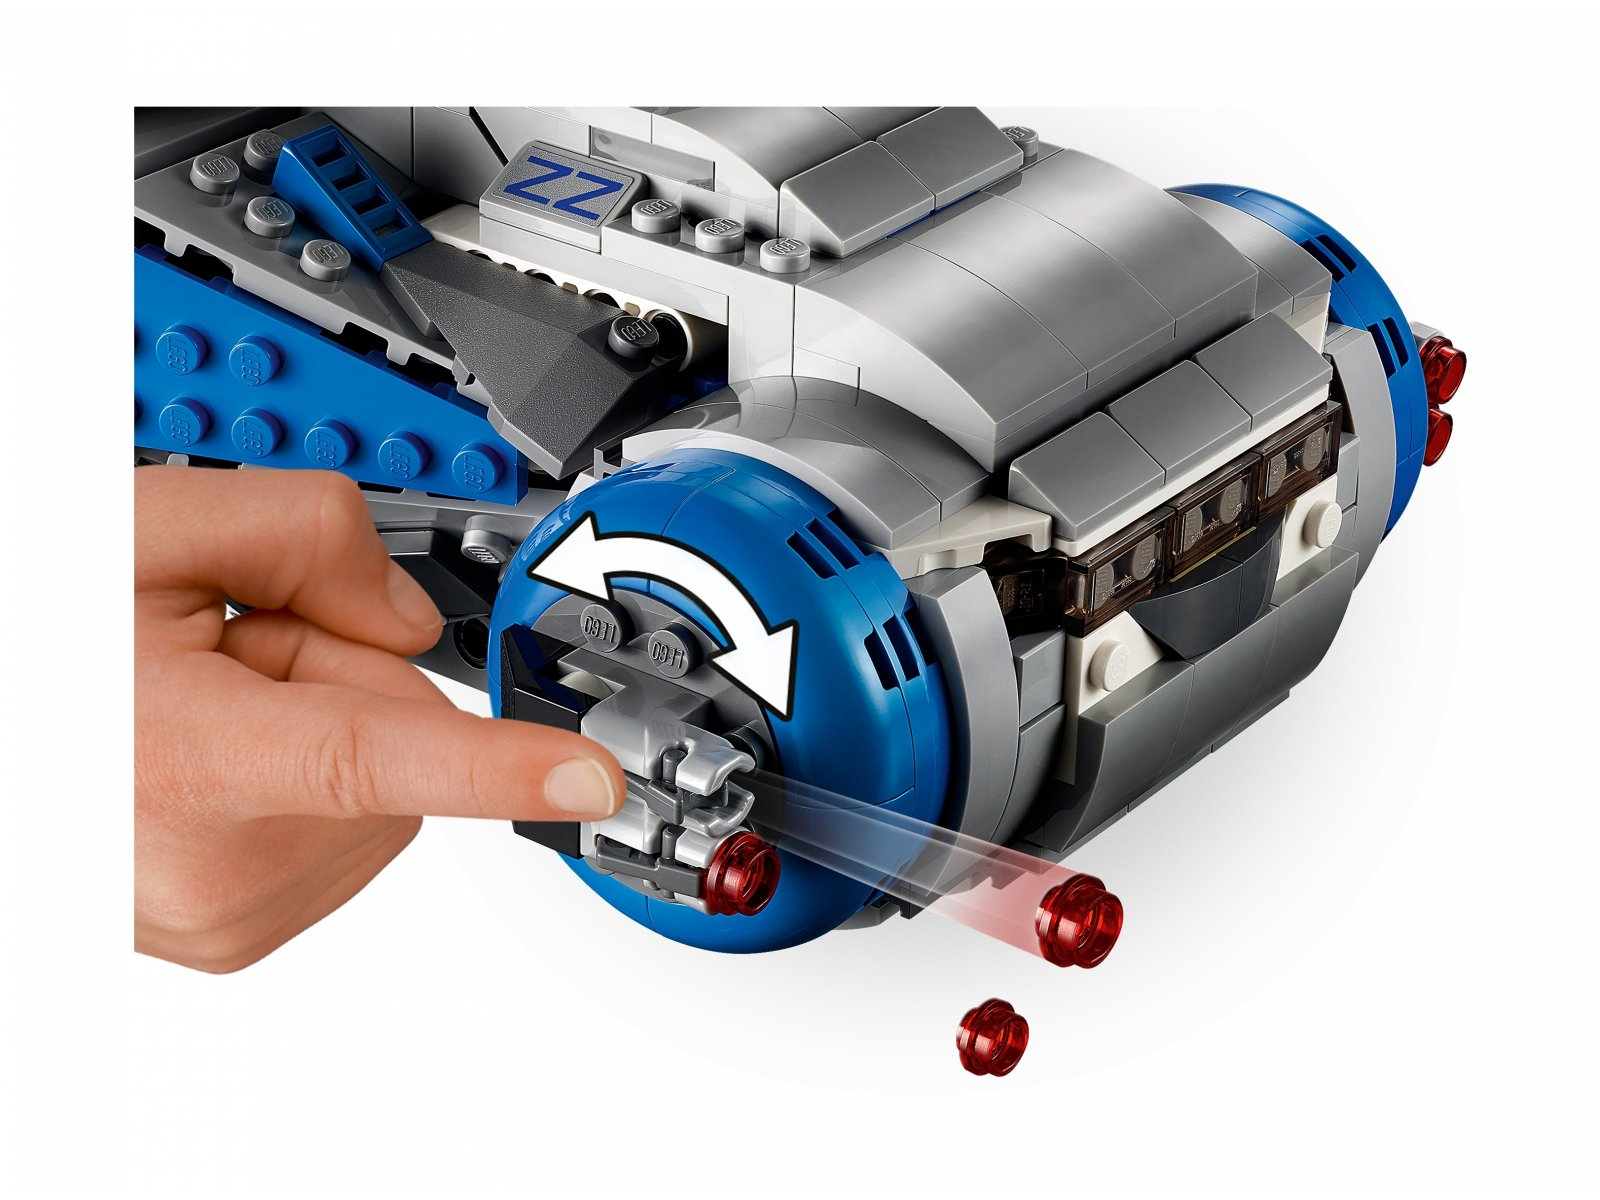 LEGO Star Wars 75293 Pojazd transportowy I-TS Ruchu Oporu